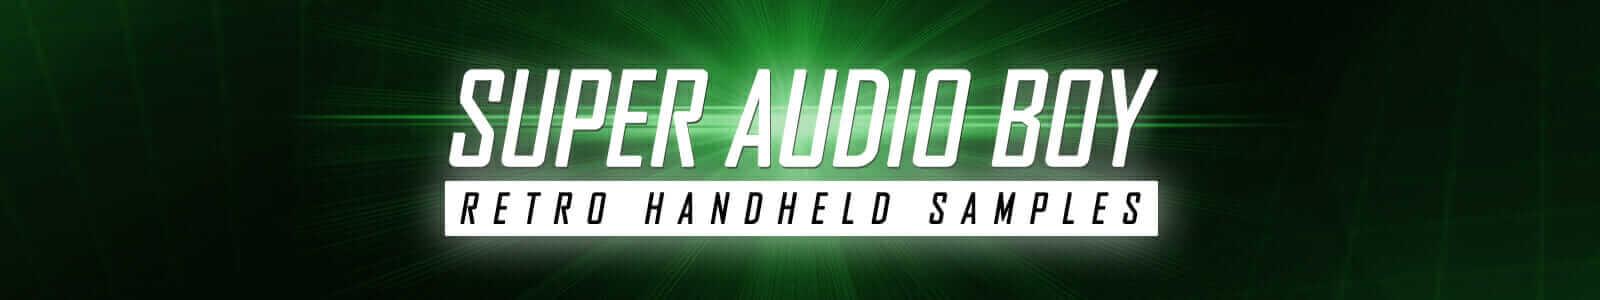 Super Audio Boy - Retro Handheld Samples (Free Instrument)